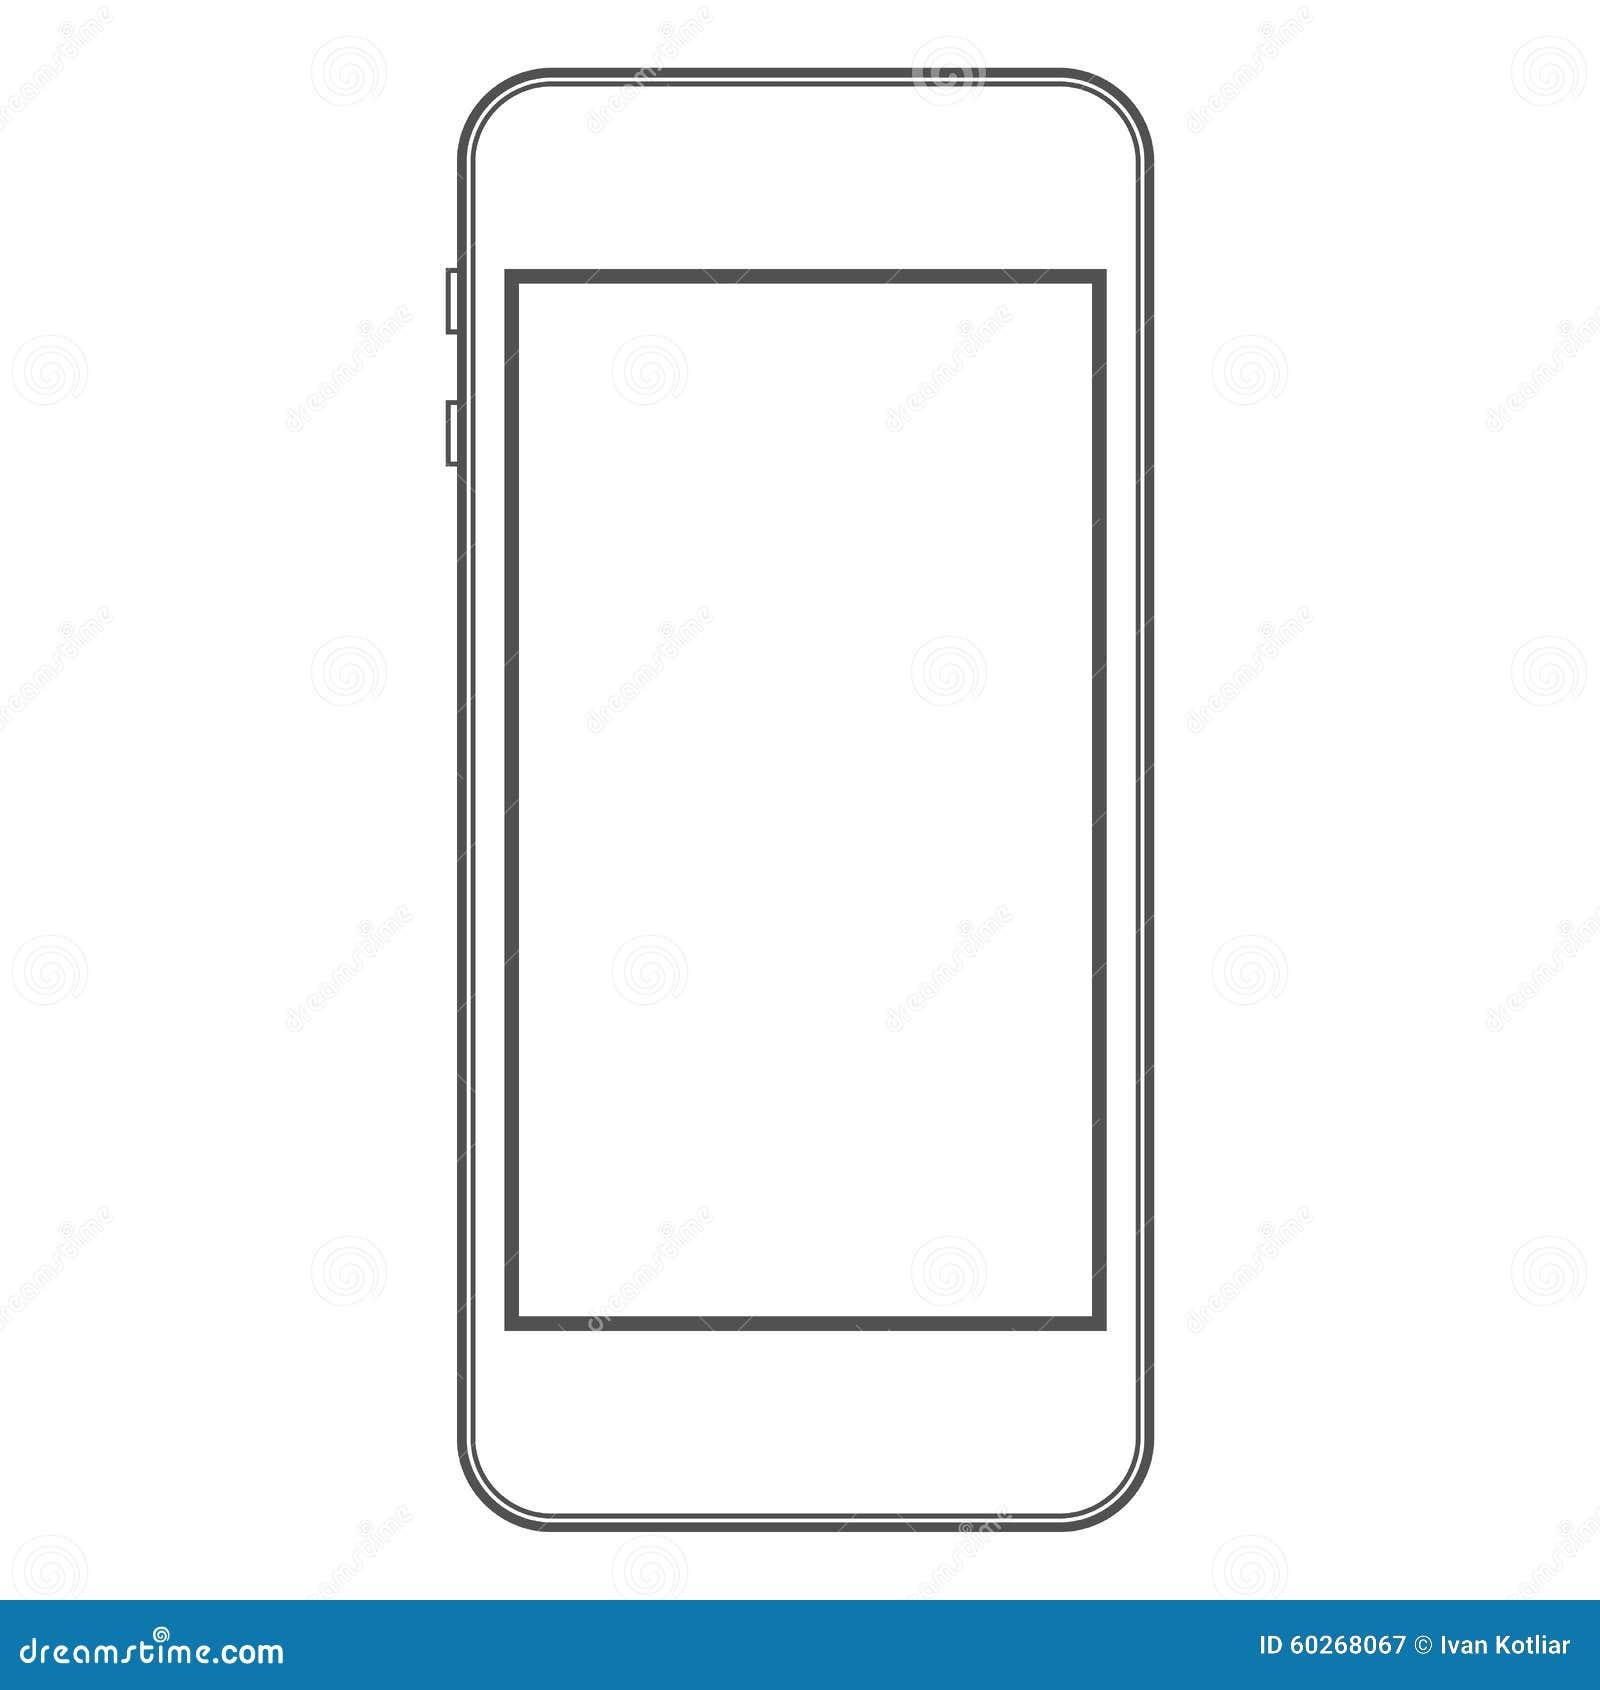 phone template stock vector illustration of iphone illustration 60268067. Black Bedroom Furniture Sets. Home Design Ideas